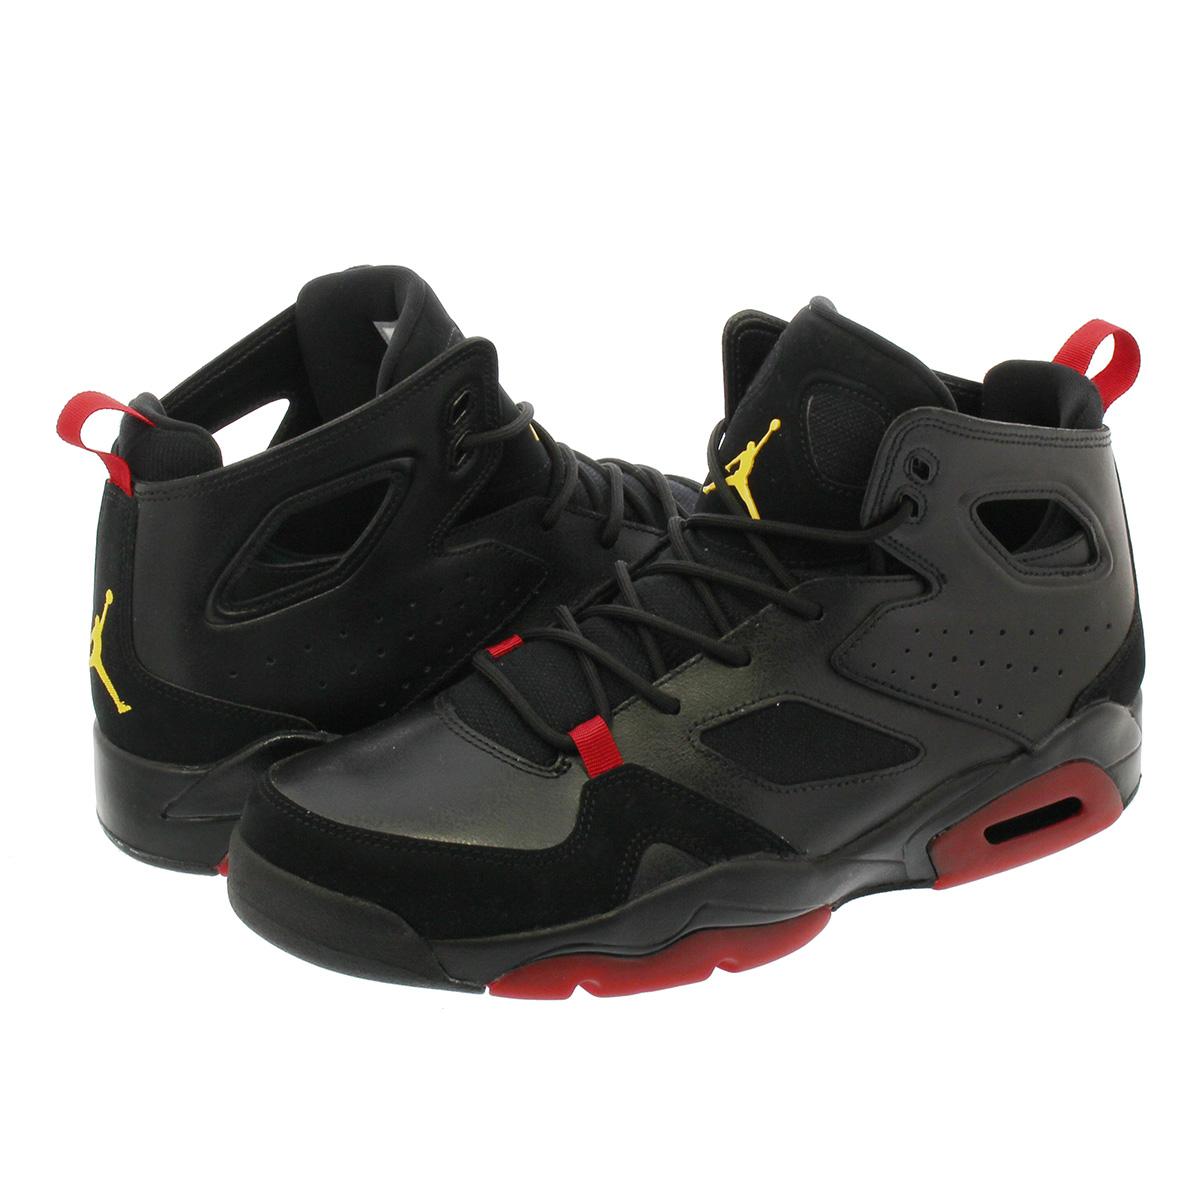 SELECT SHOP LOWTEX | Rakuten Global Market: NIKE JORDAN FLIGHT CLUB 91 Nike Jordan flight club 91 BLACK/VARSITY RED 555,475-067